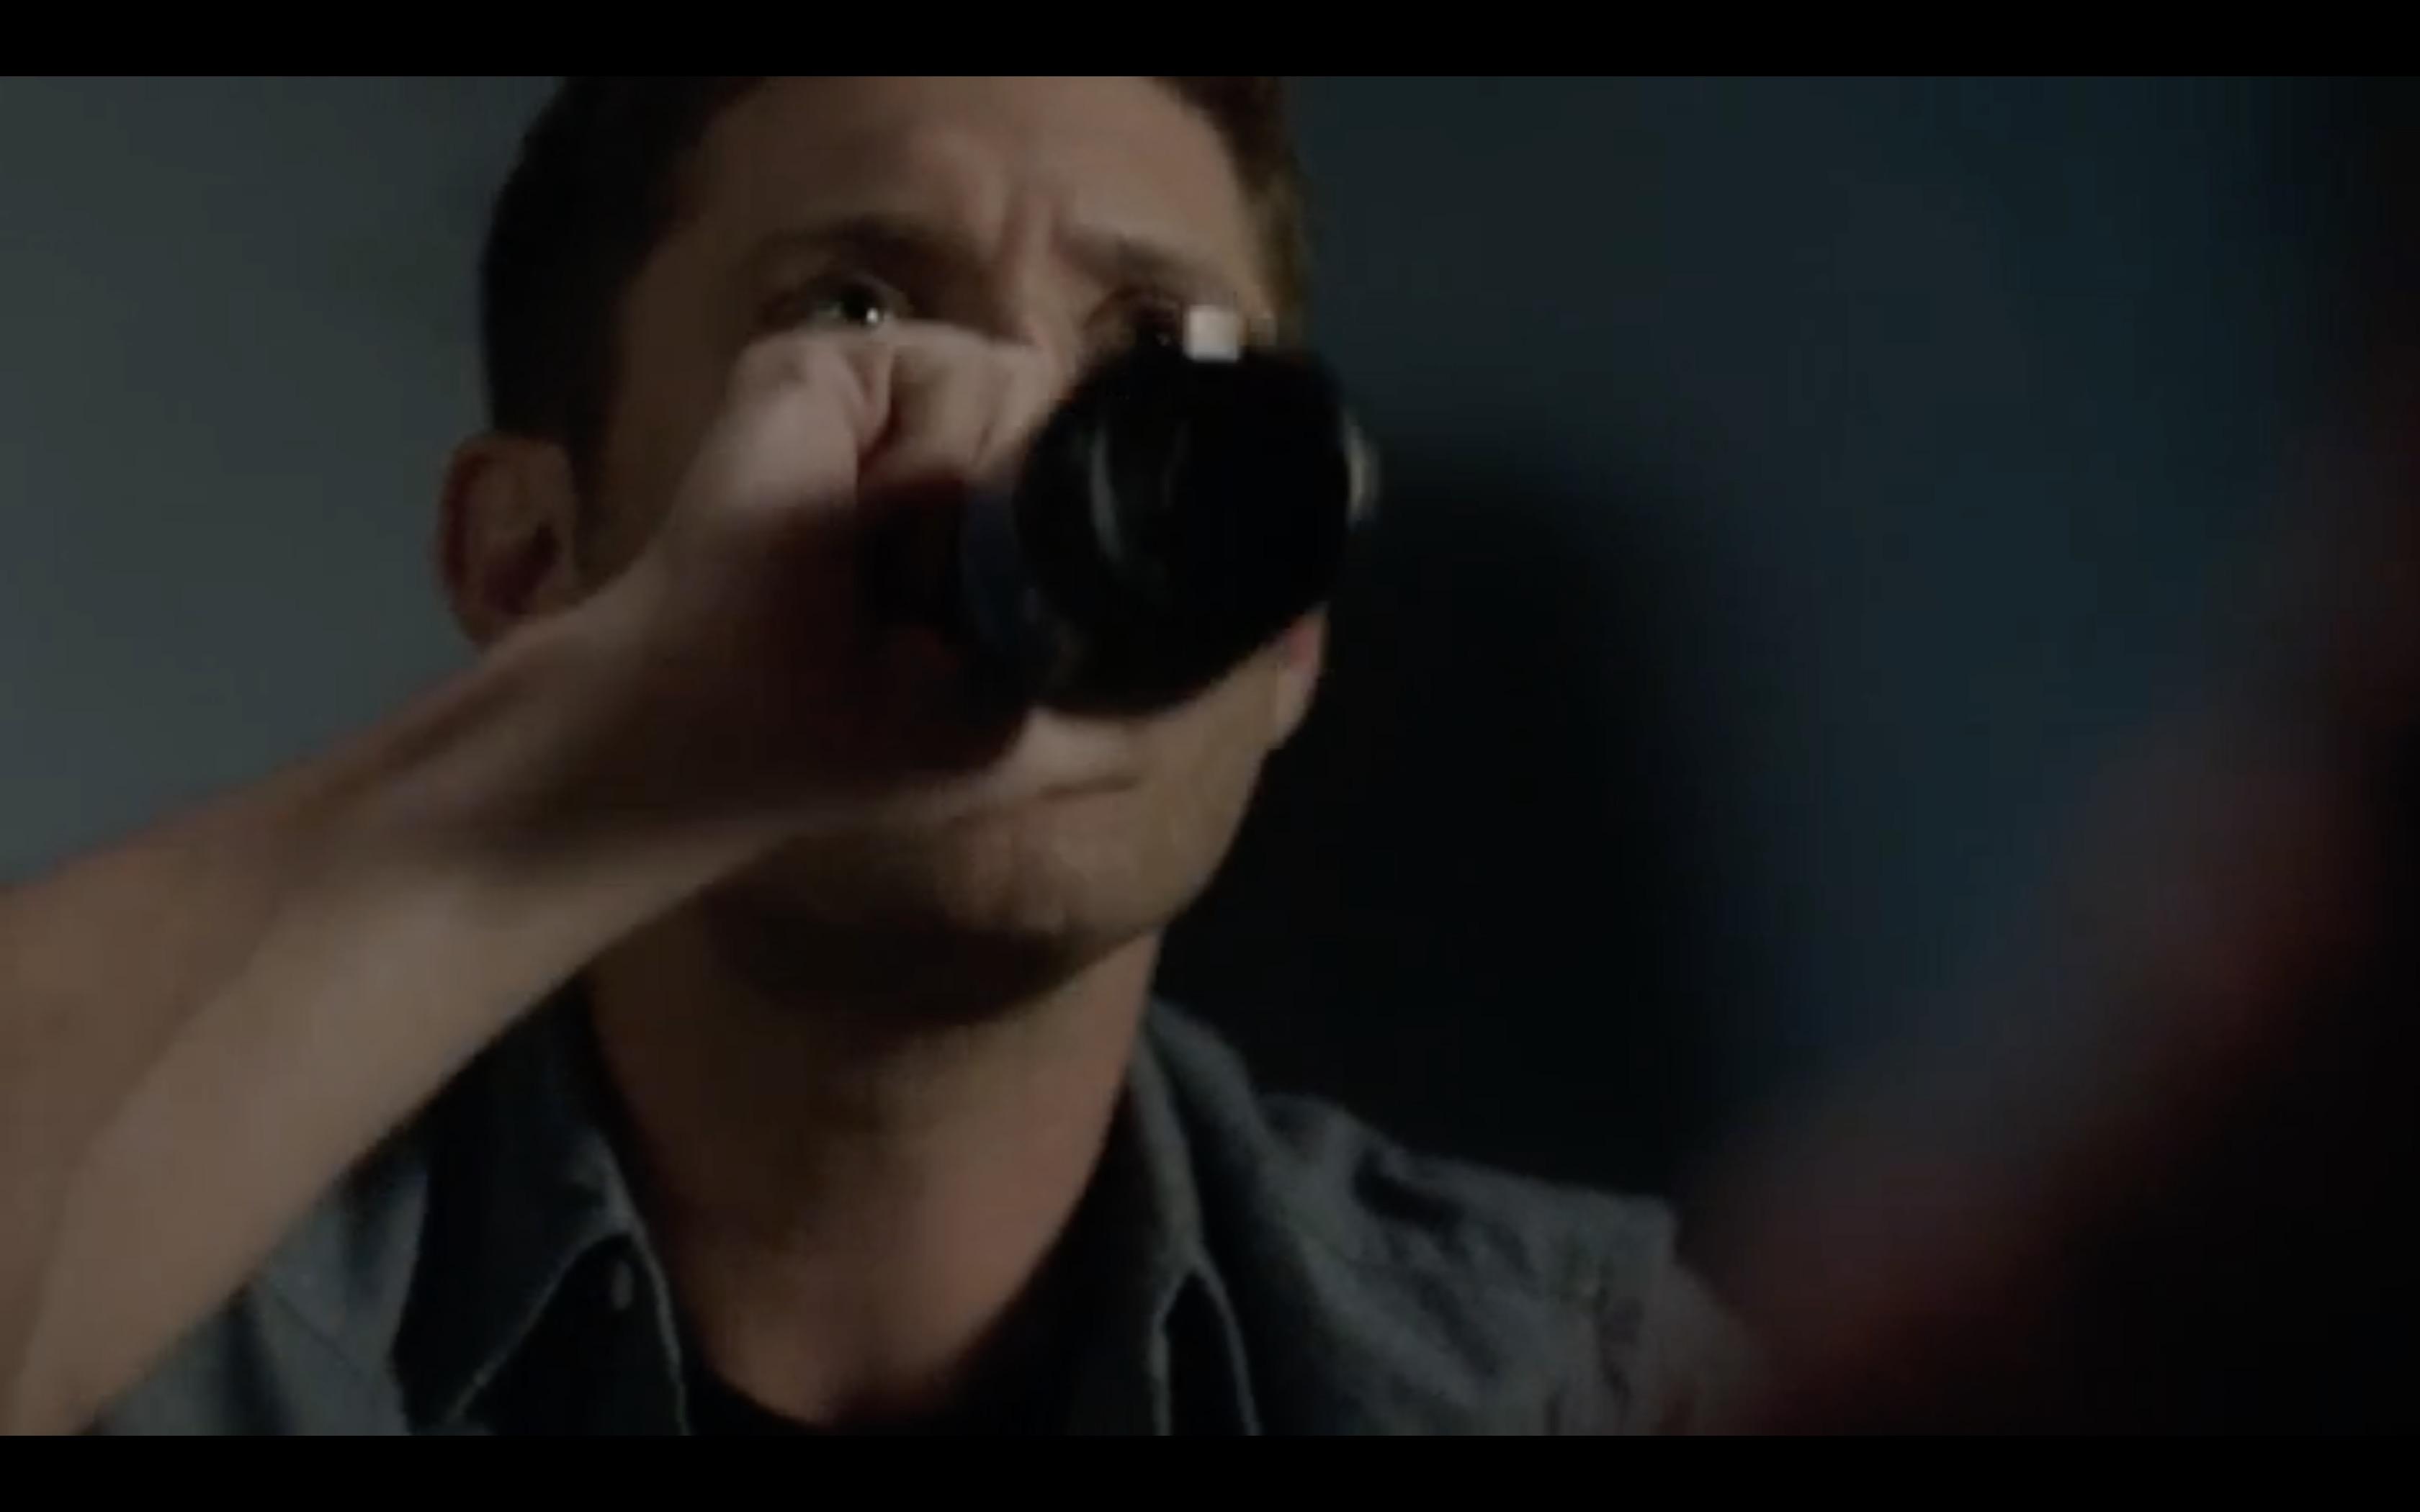 supernatural jack learning from dean drinking beer eating fries mttg